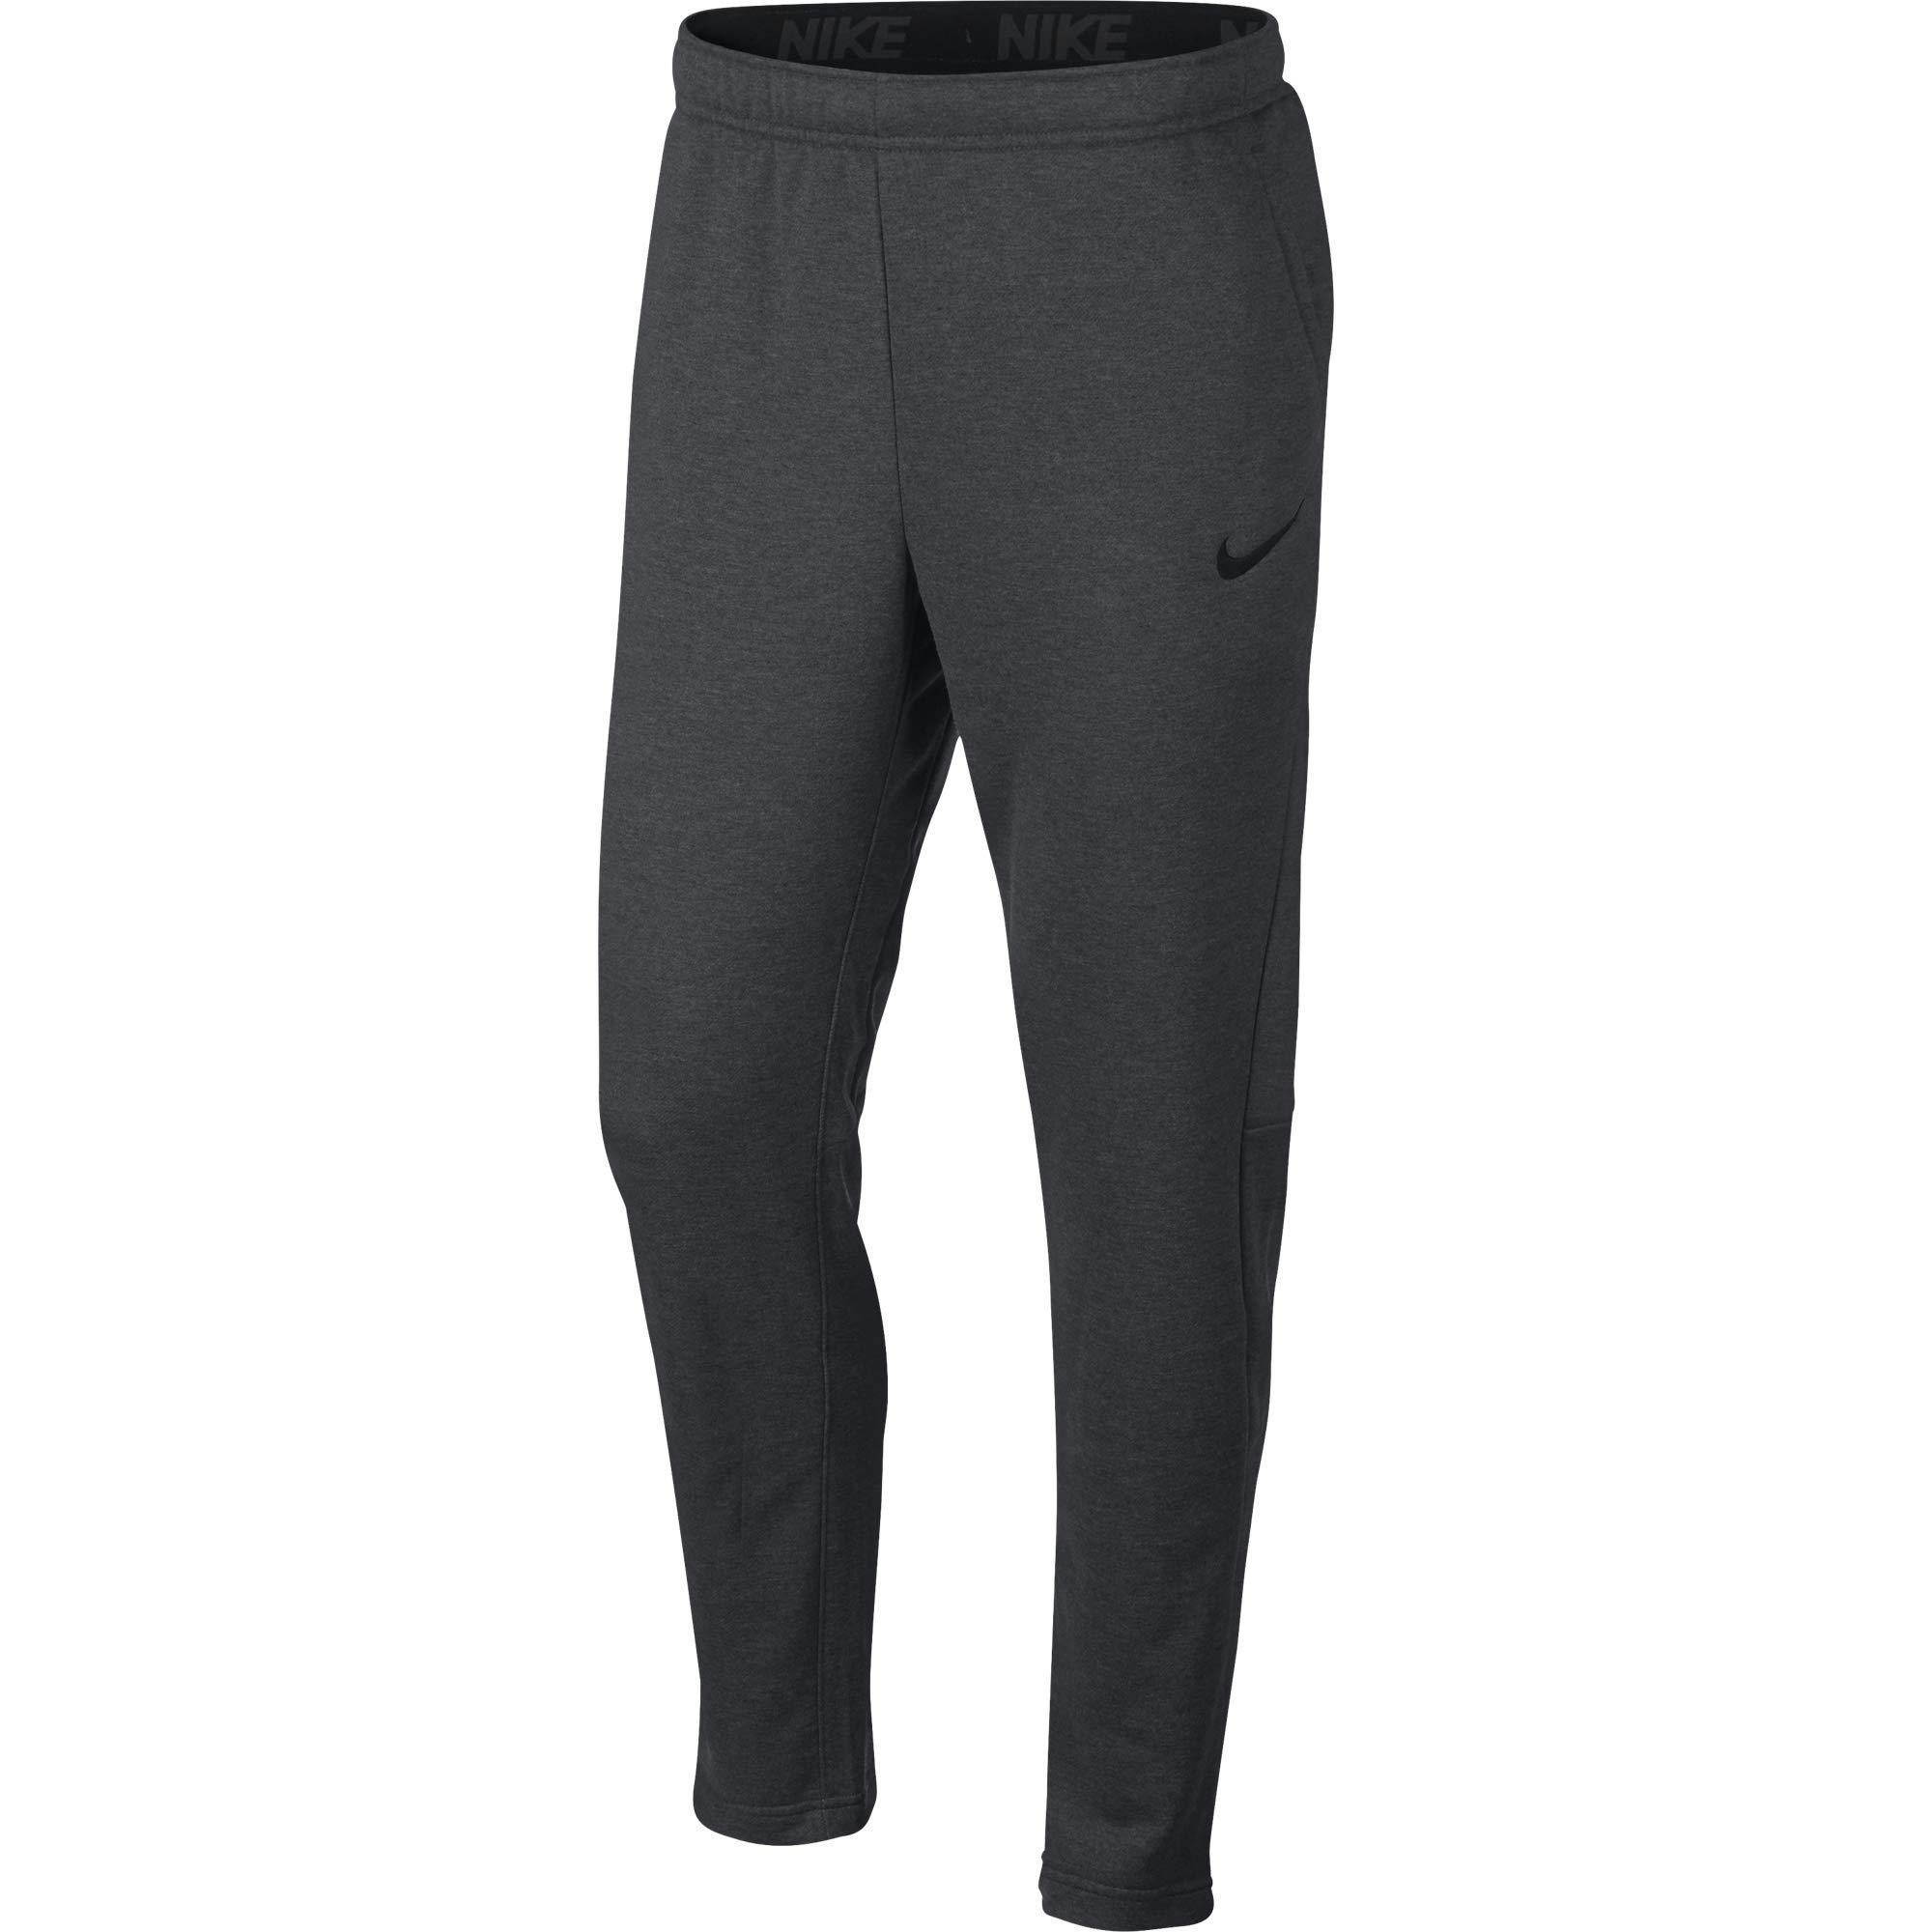 Nike Men's Dry Fleece Training Pants, Charcoal